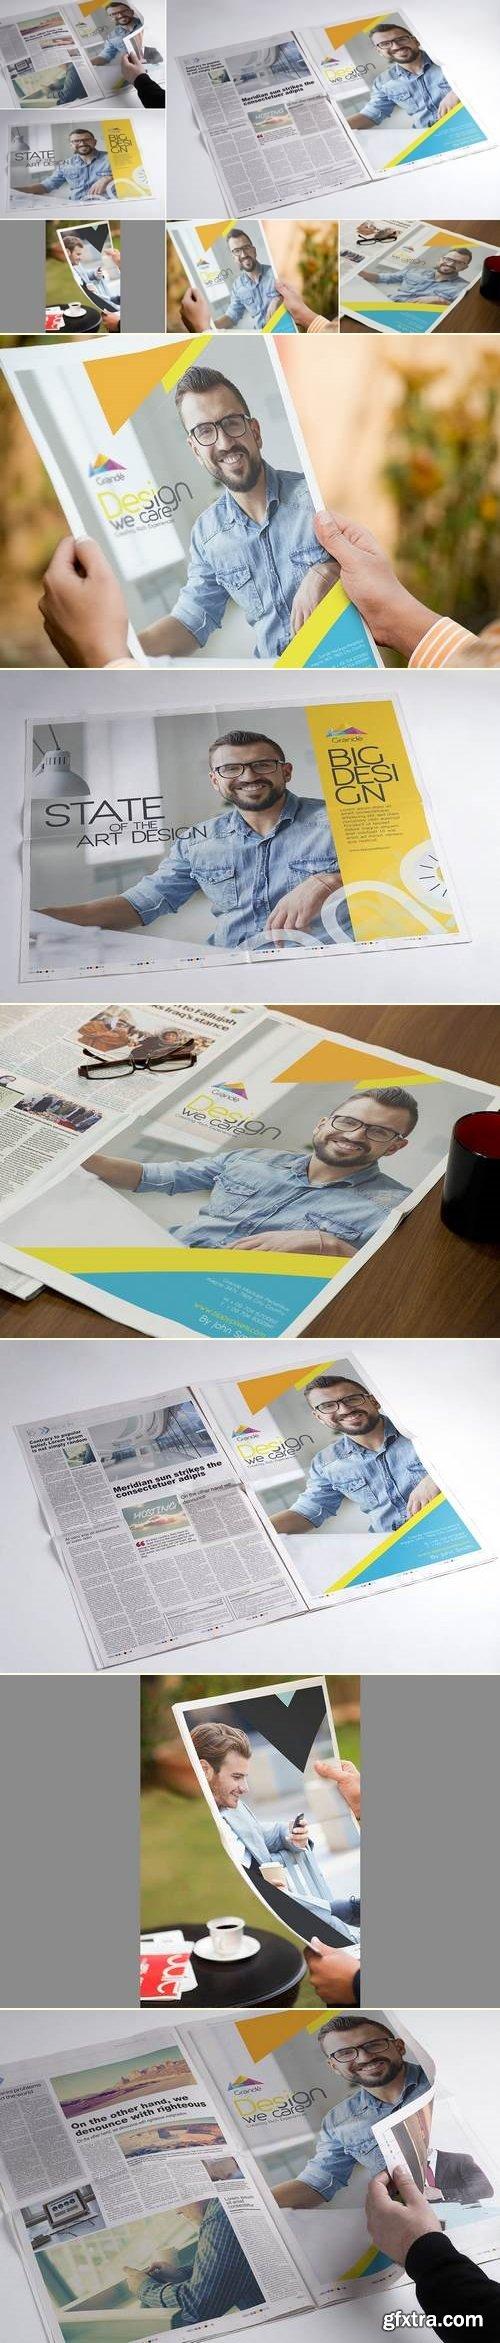 Full Page Newspaper Mockups